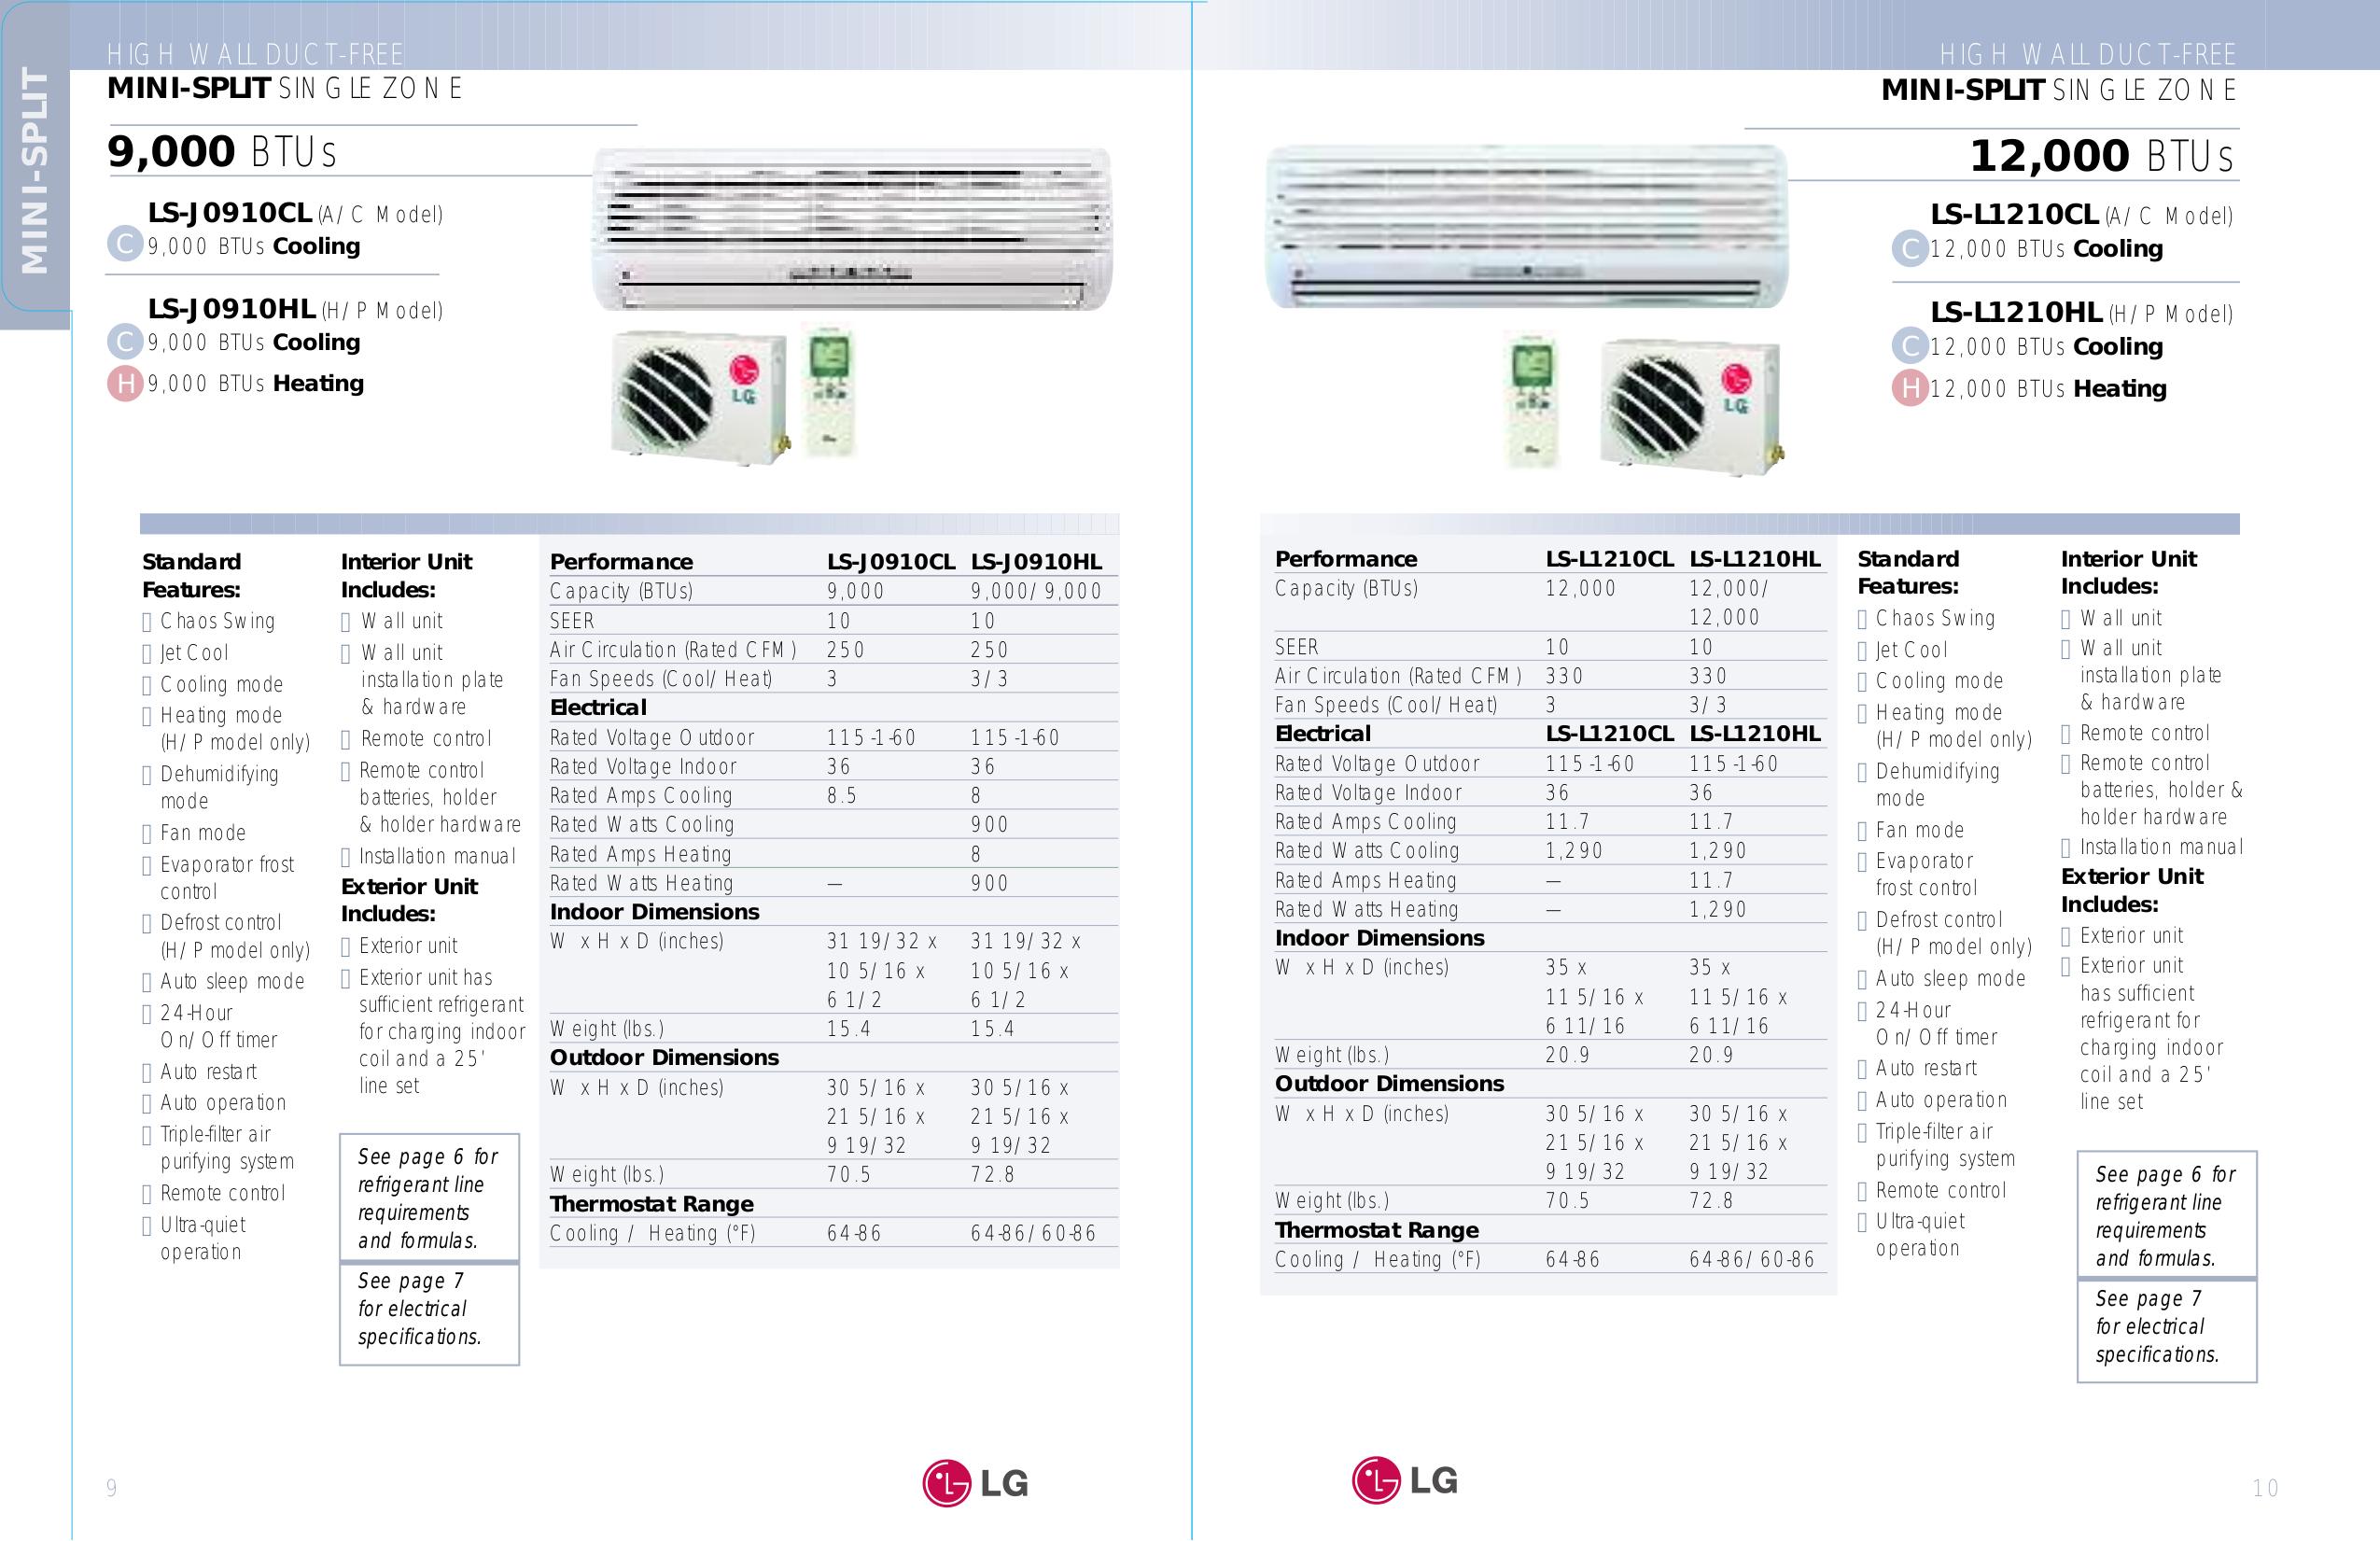 lg wall window air conditioner manual pdf